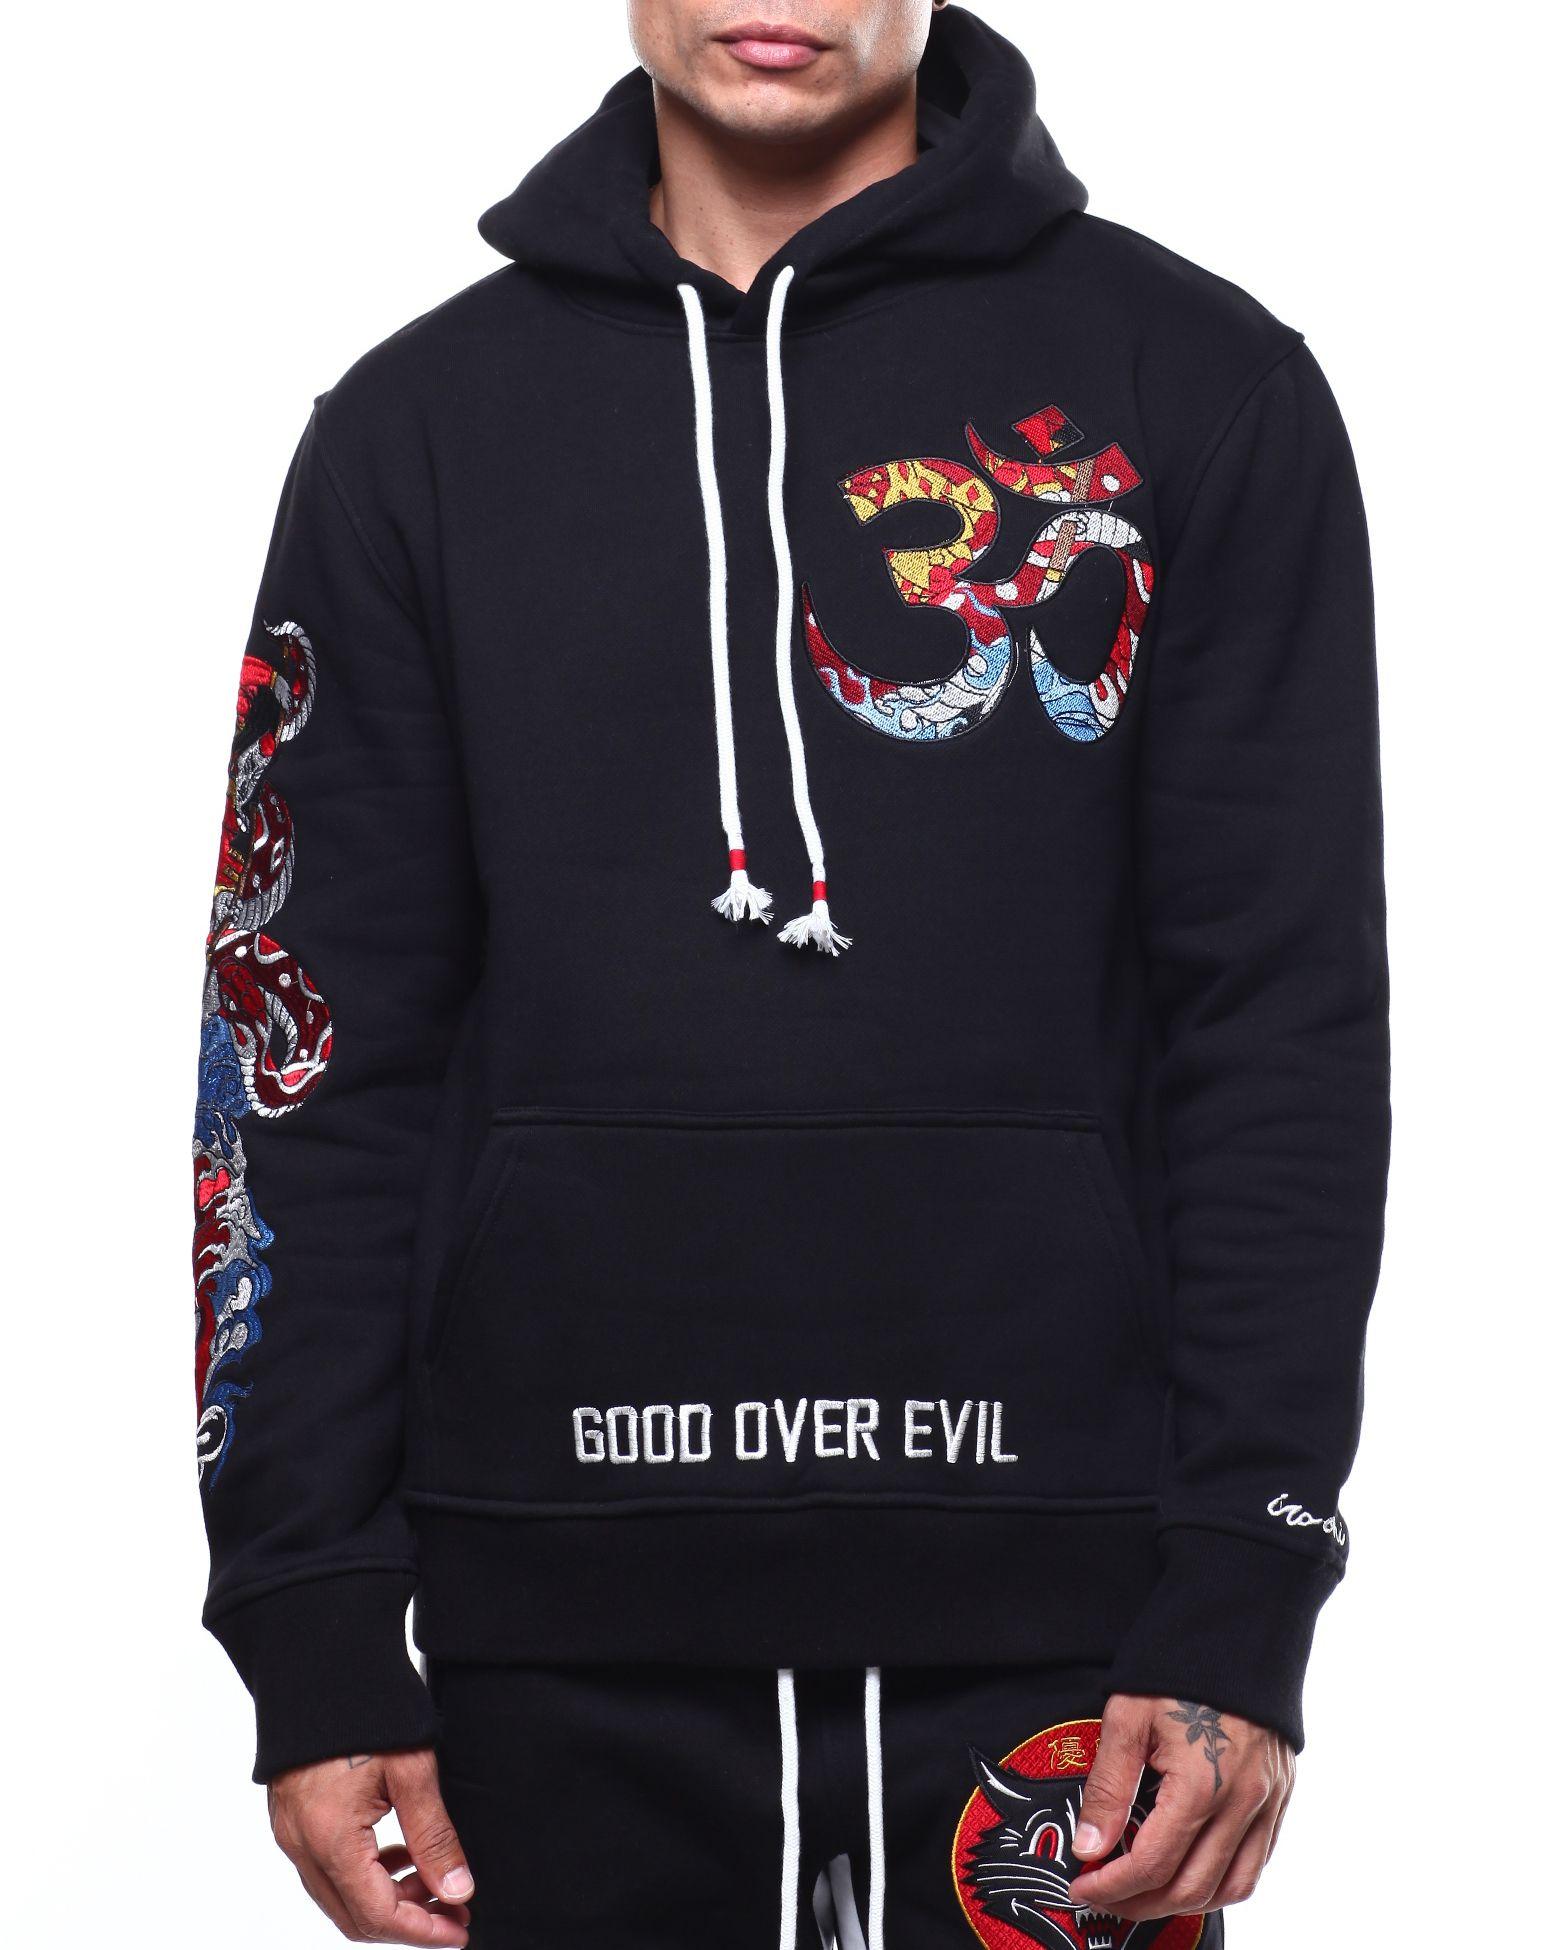 Iro ochi hoodie super unique style | Hoodies, Unique hoodies